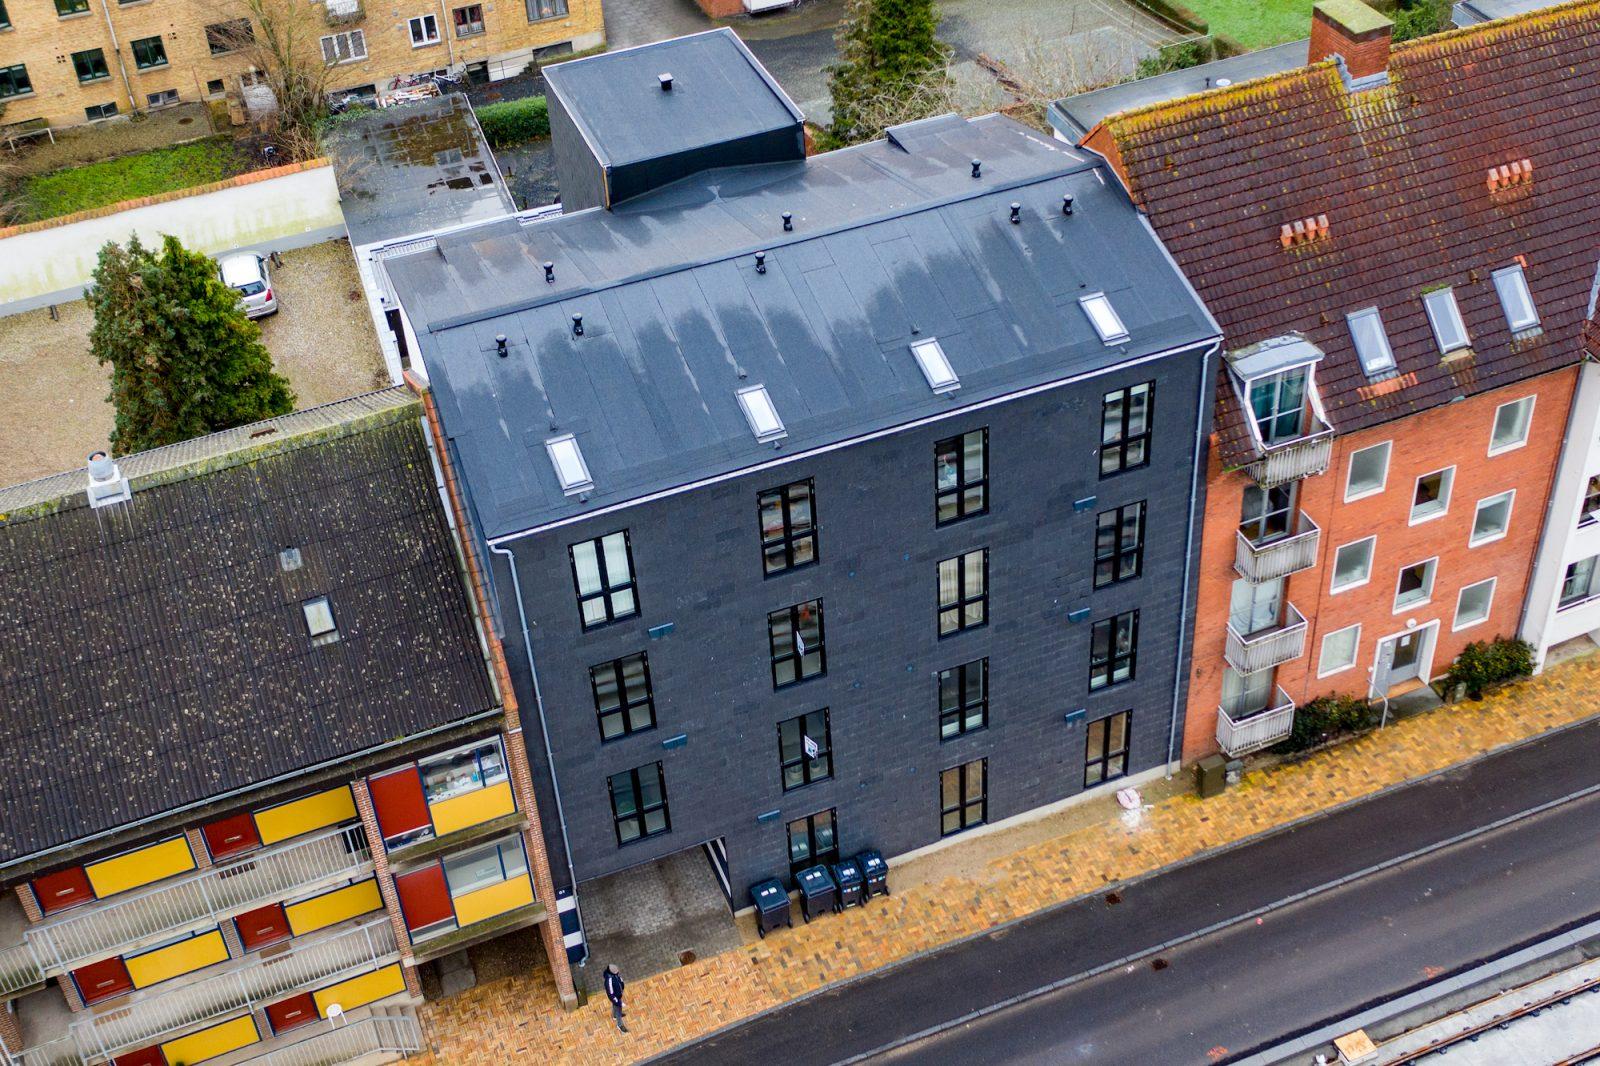 Bygning på Nyborgvej- Safe-con - 15